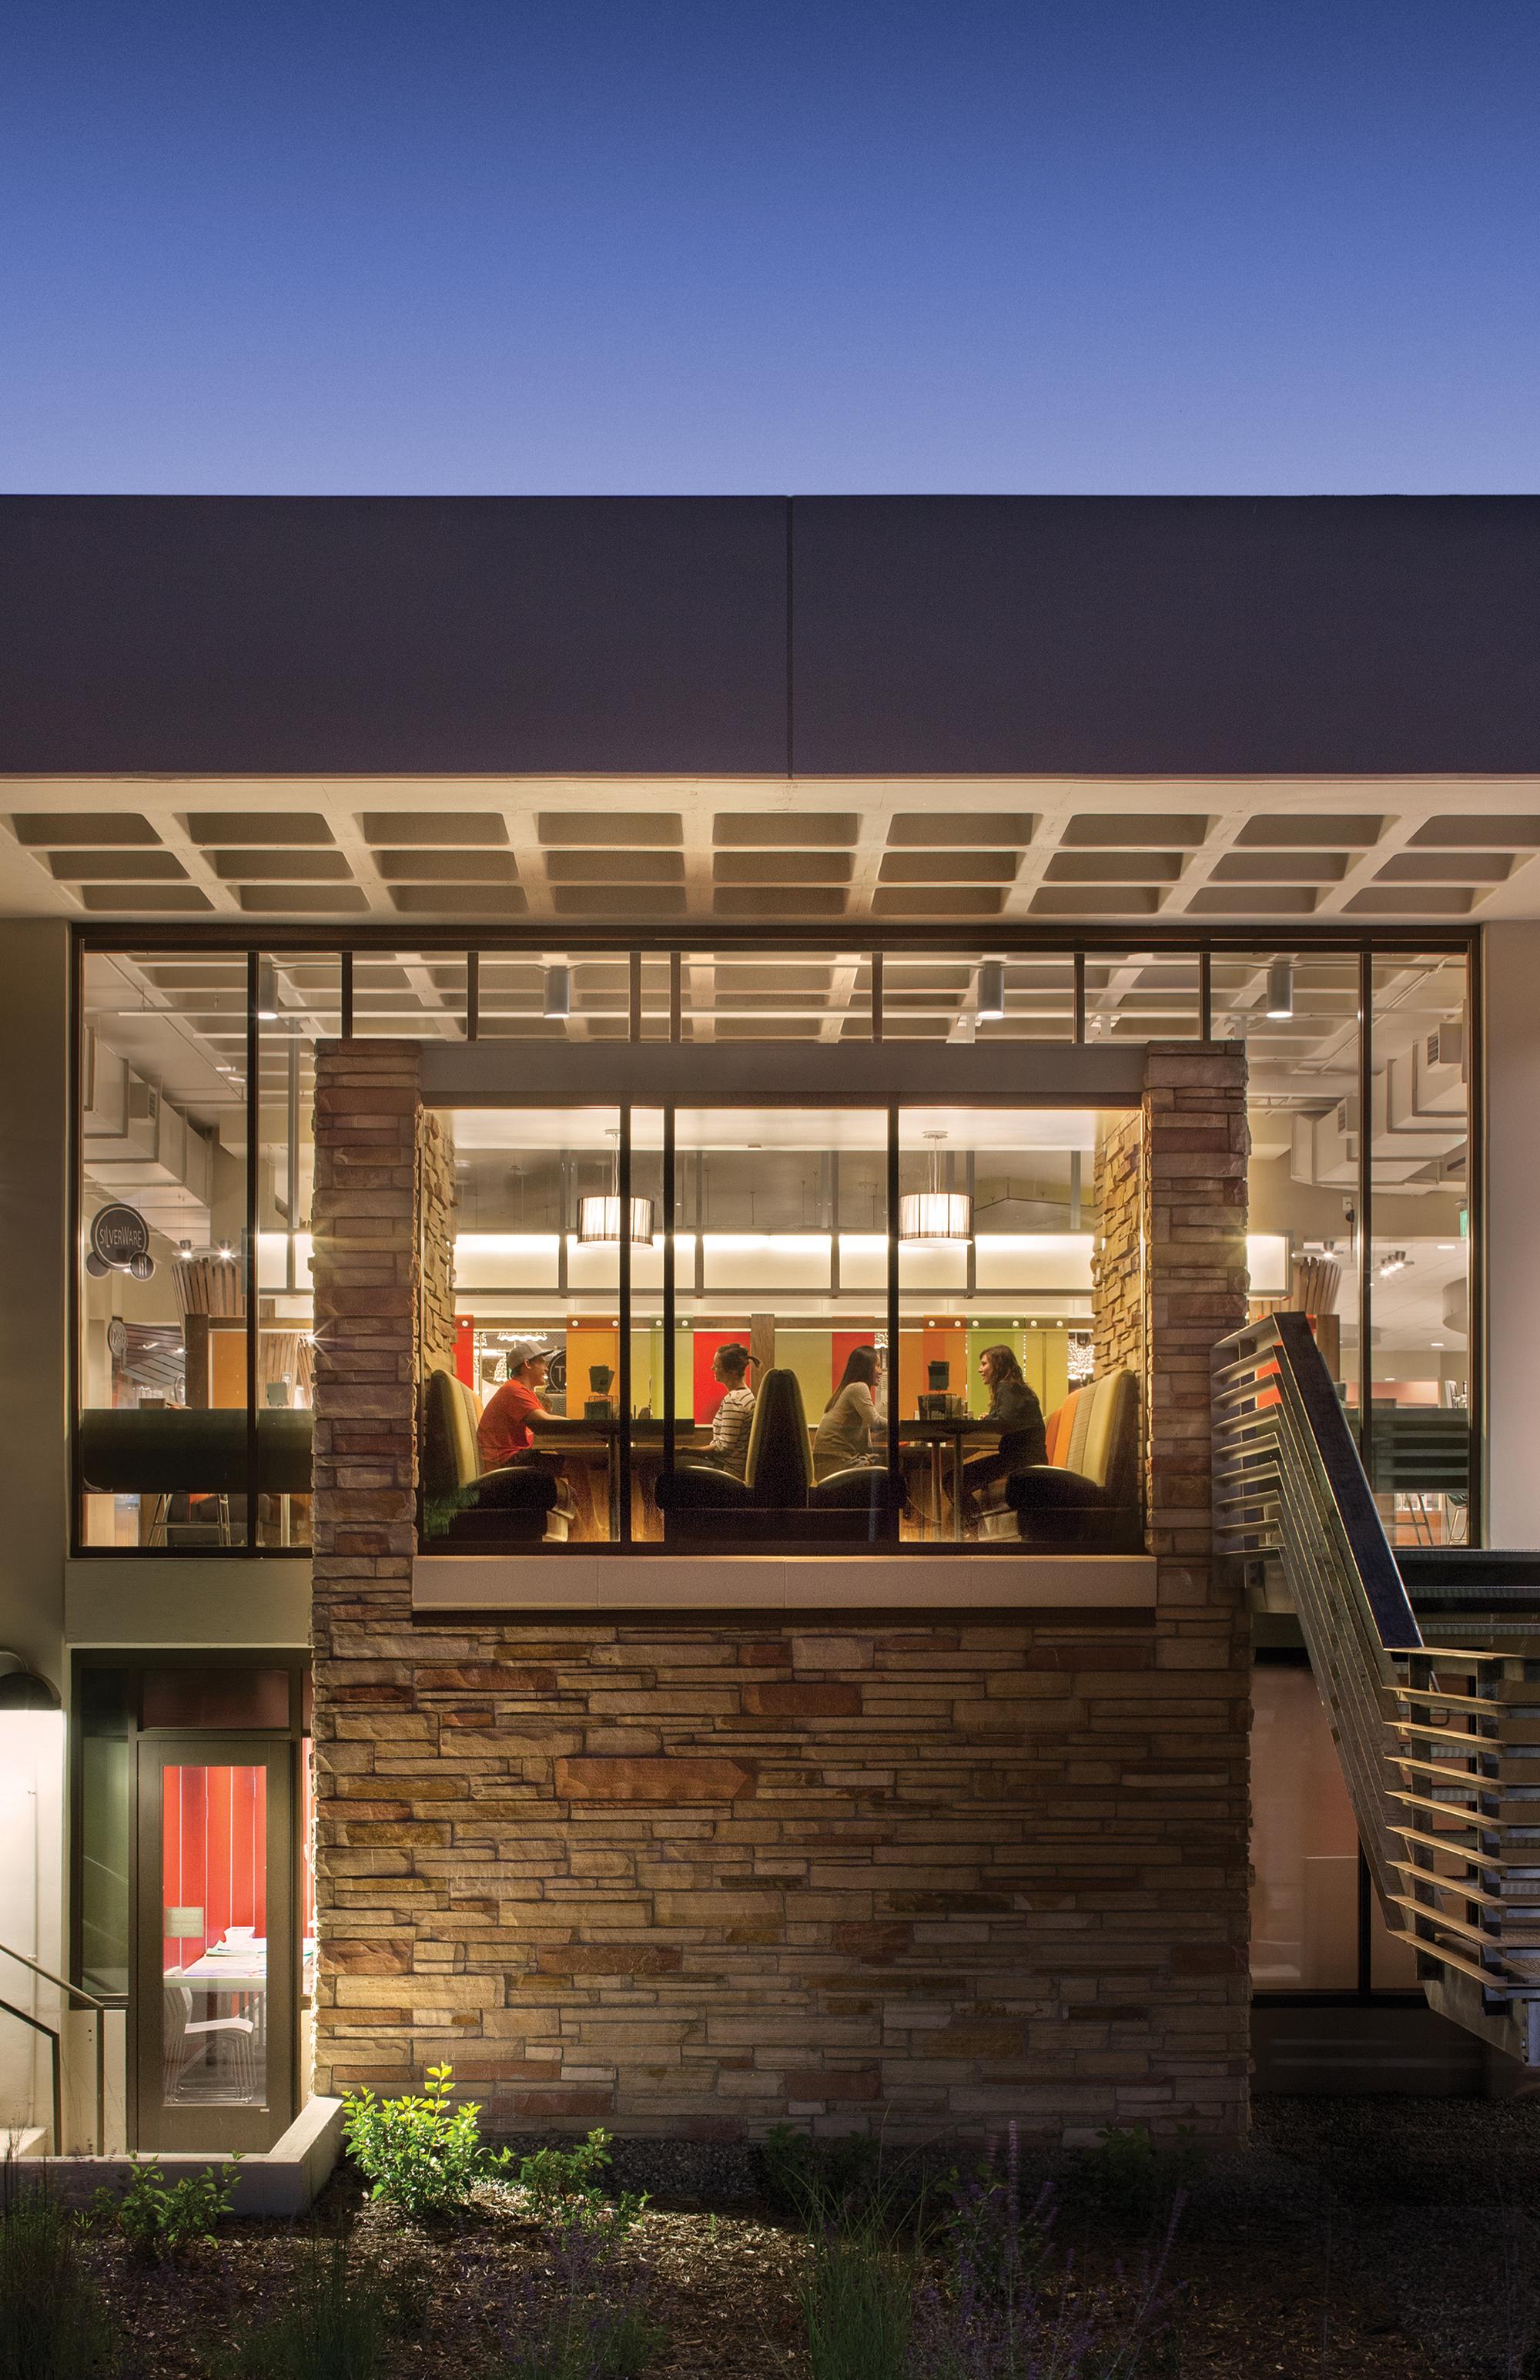 colorado_state_university_fort_collins_durrell_center_window.jpg